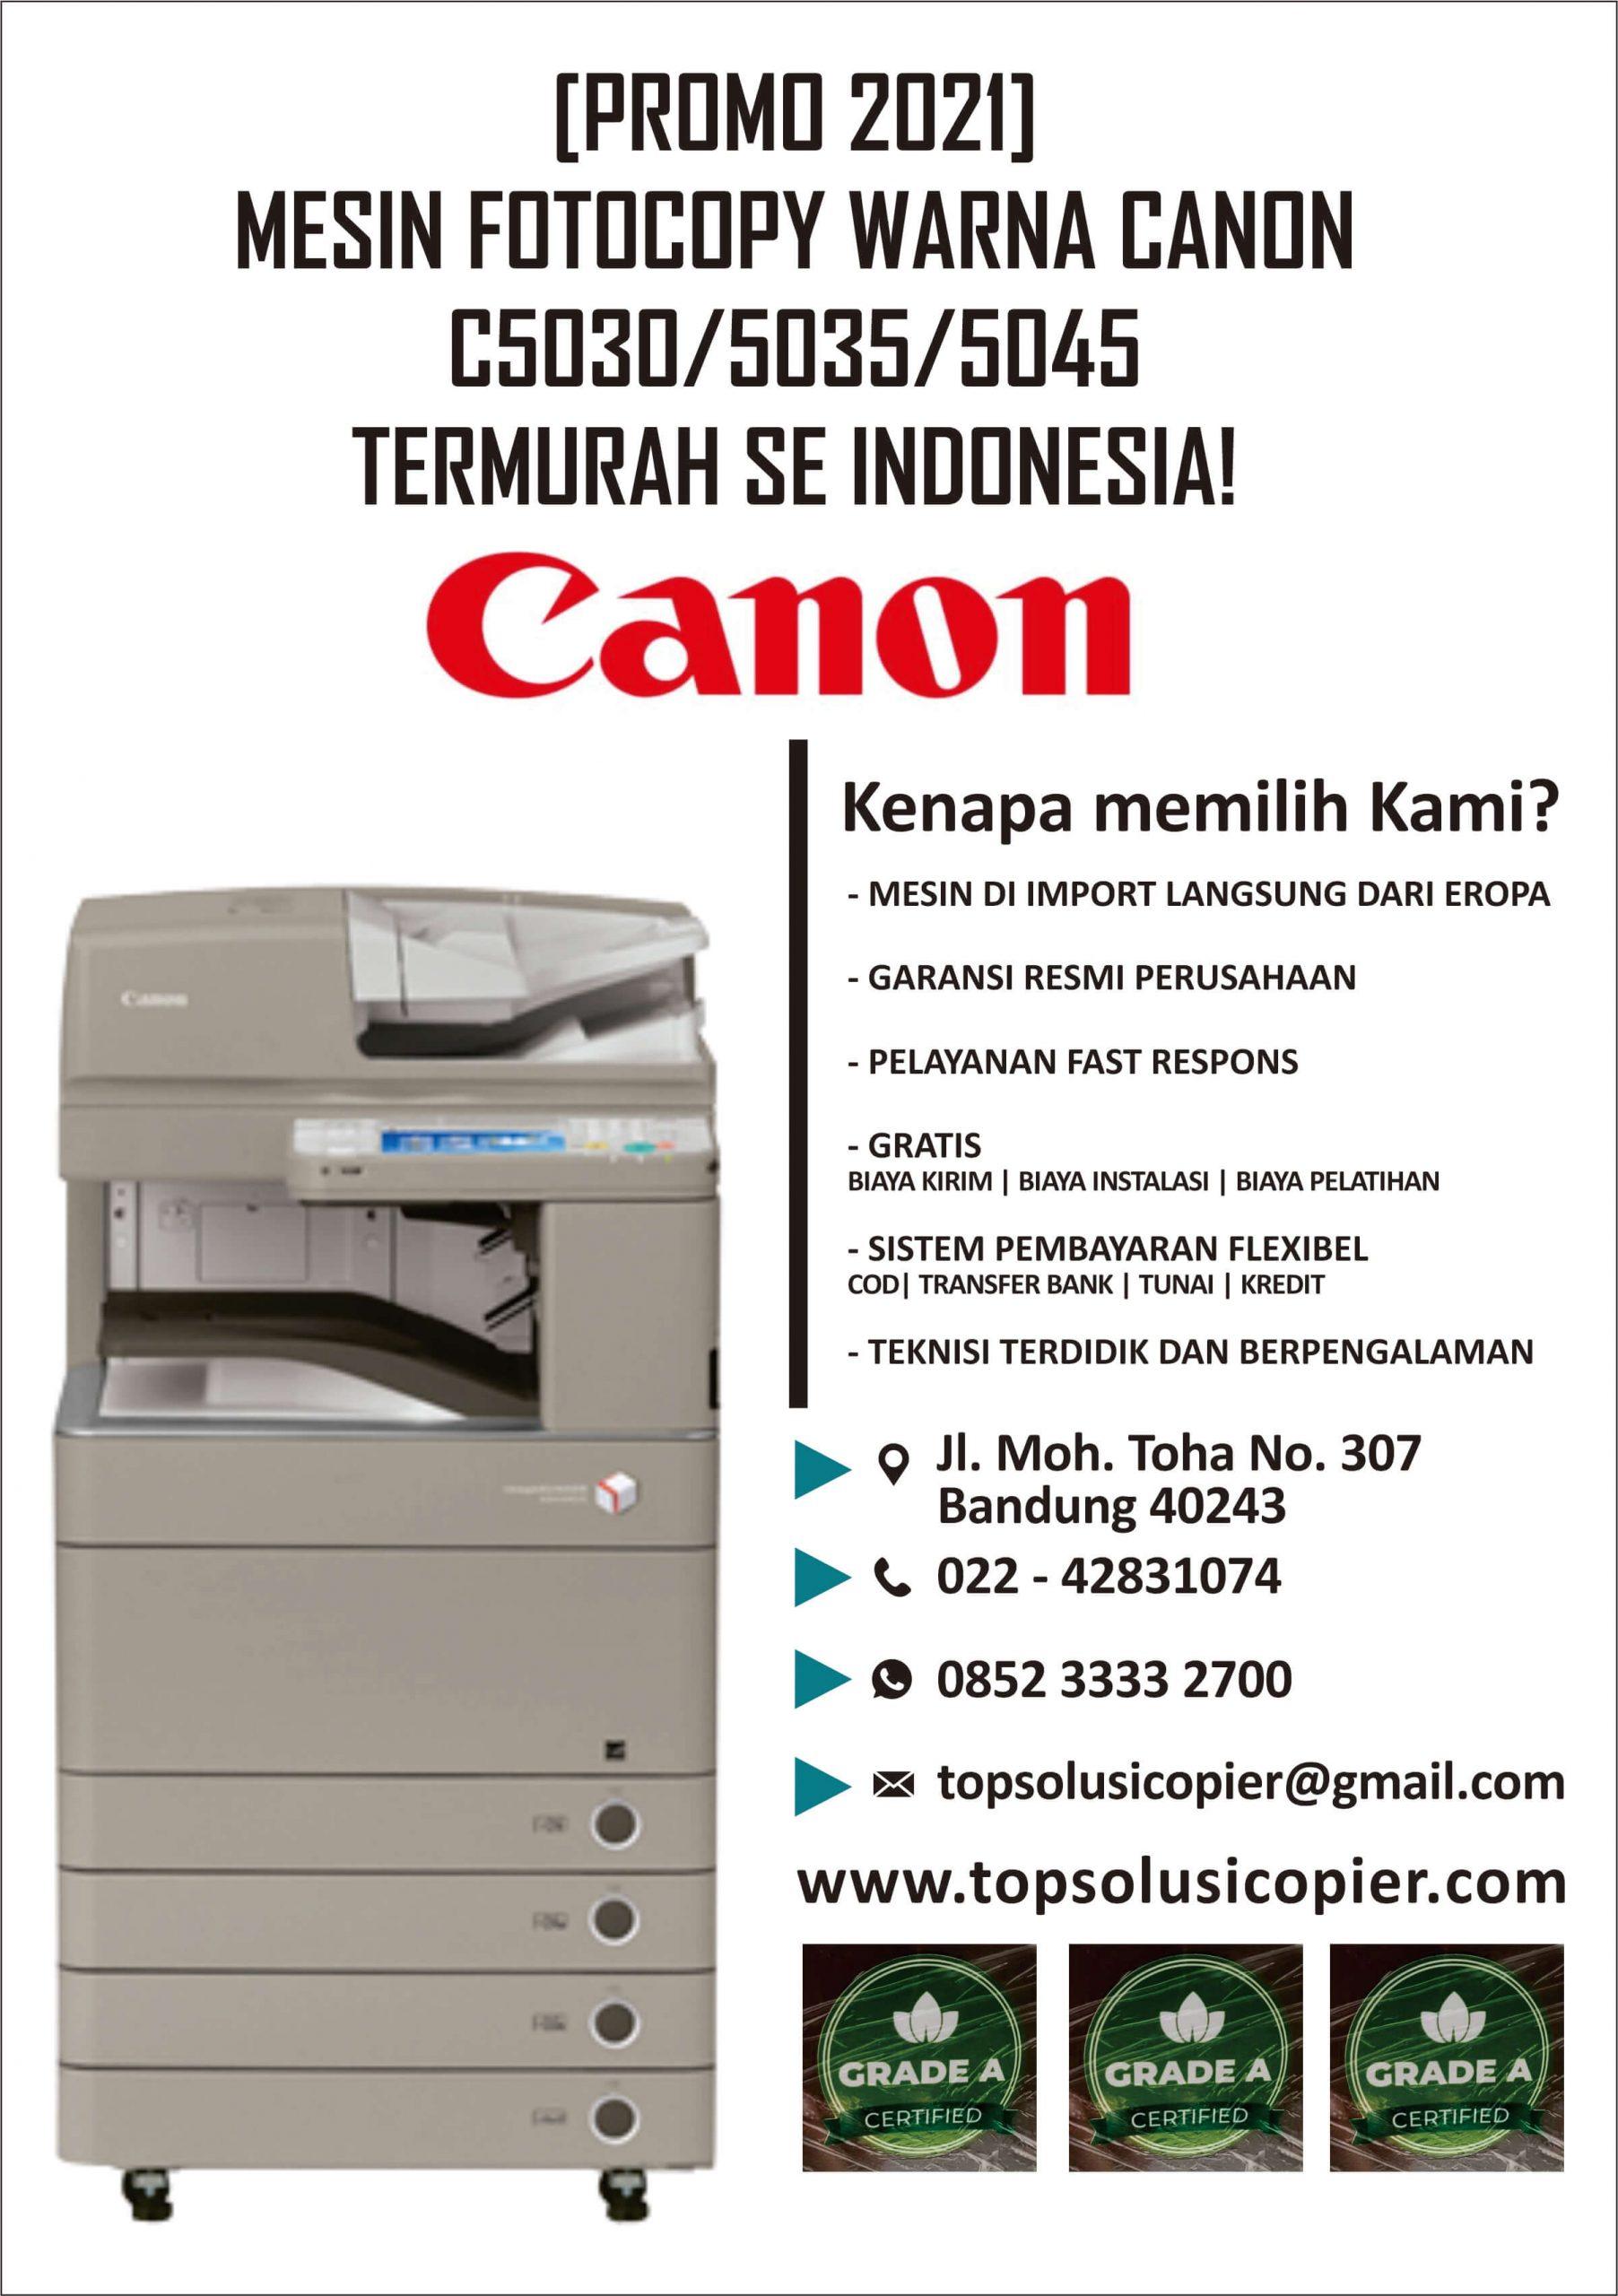 mesin fotocopy warna canon depok